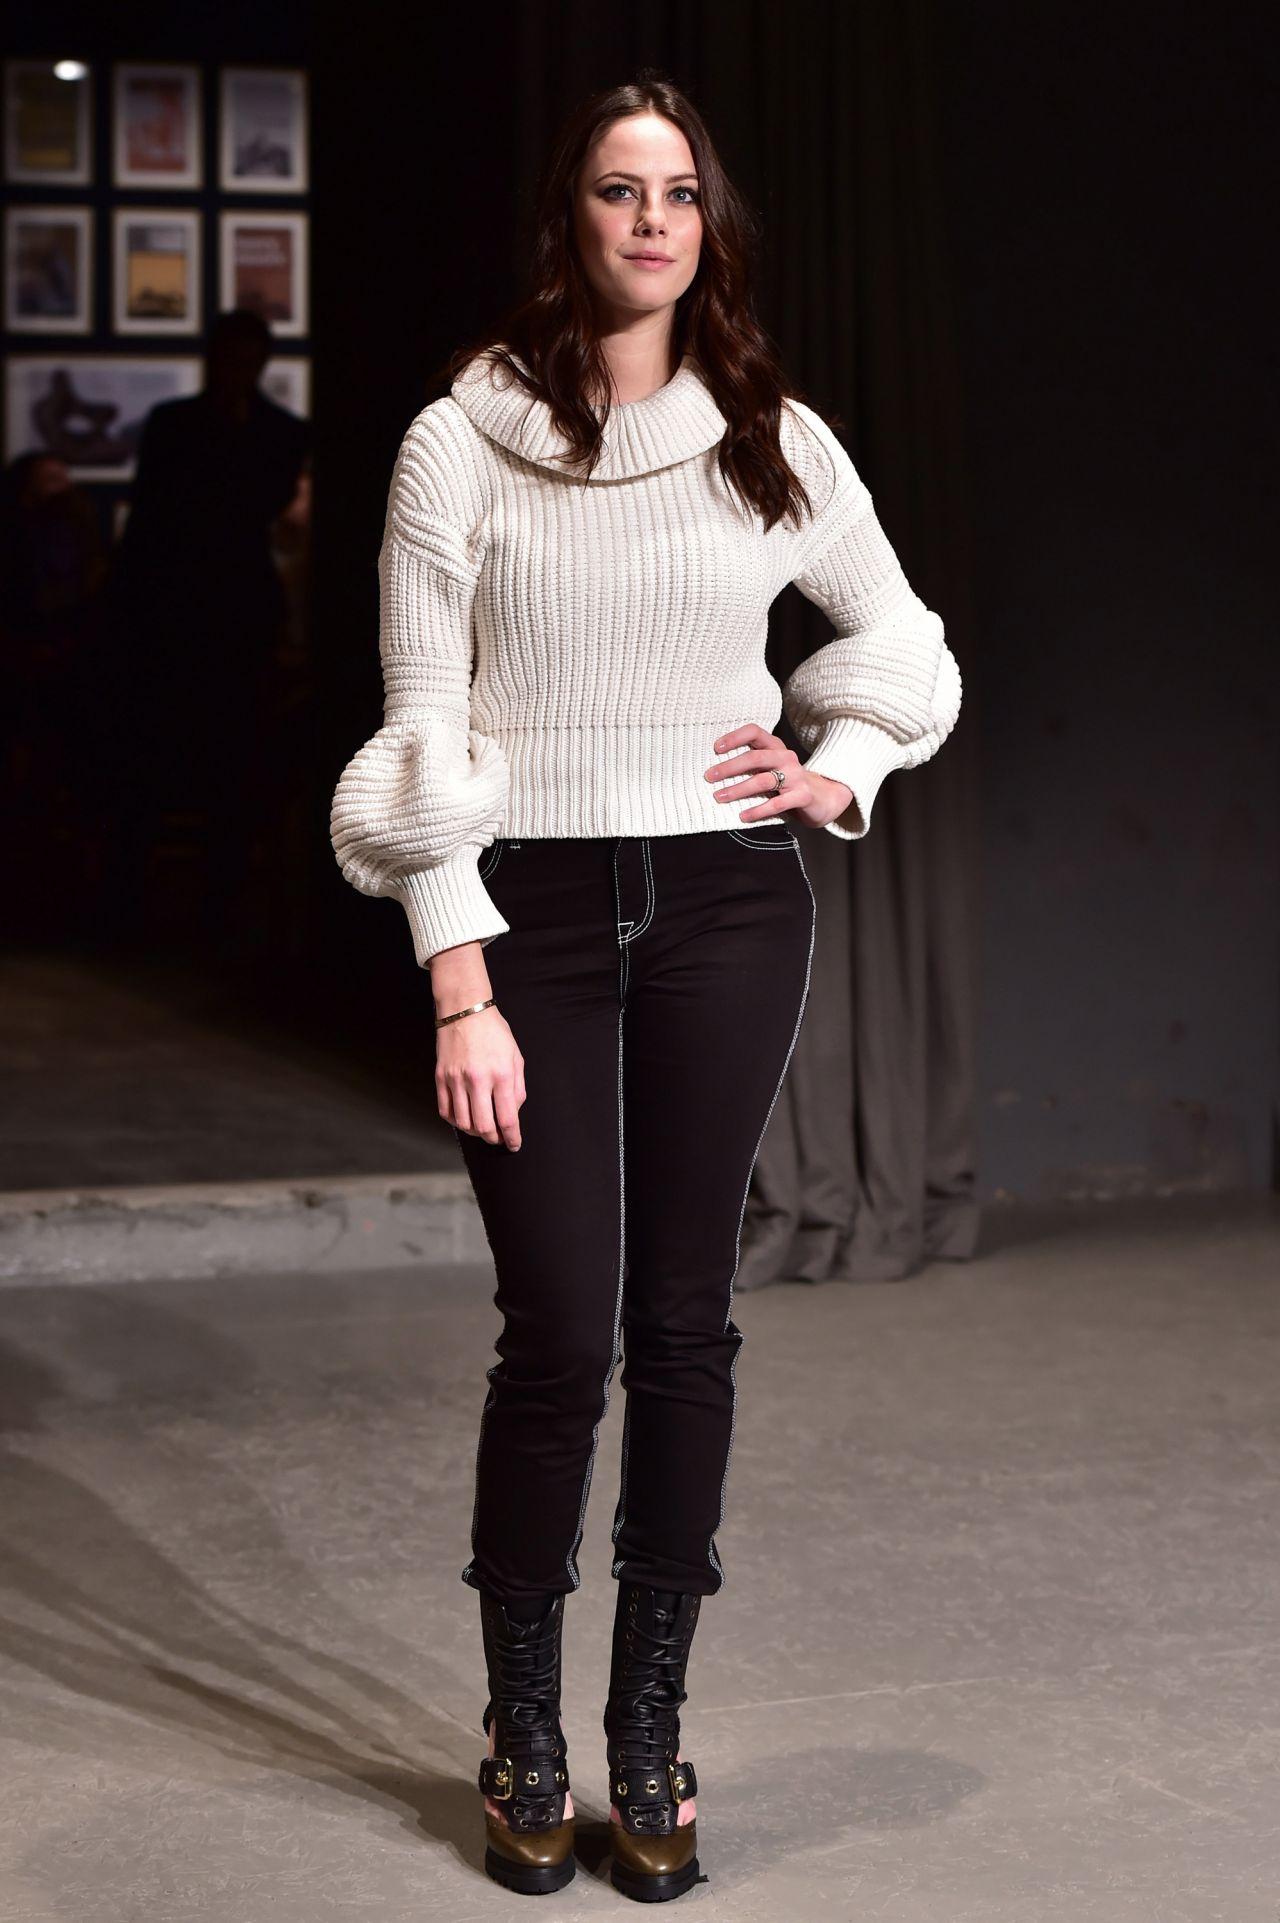 Kaya scodelario burberry fashion show in london 2 20 2017 - Burberry fashion show ...